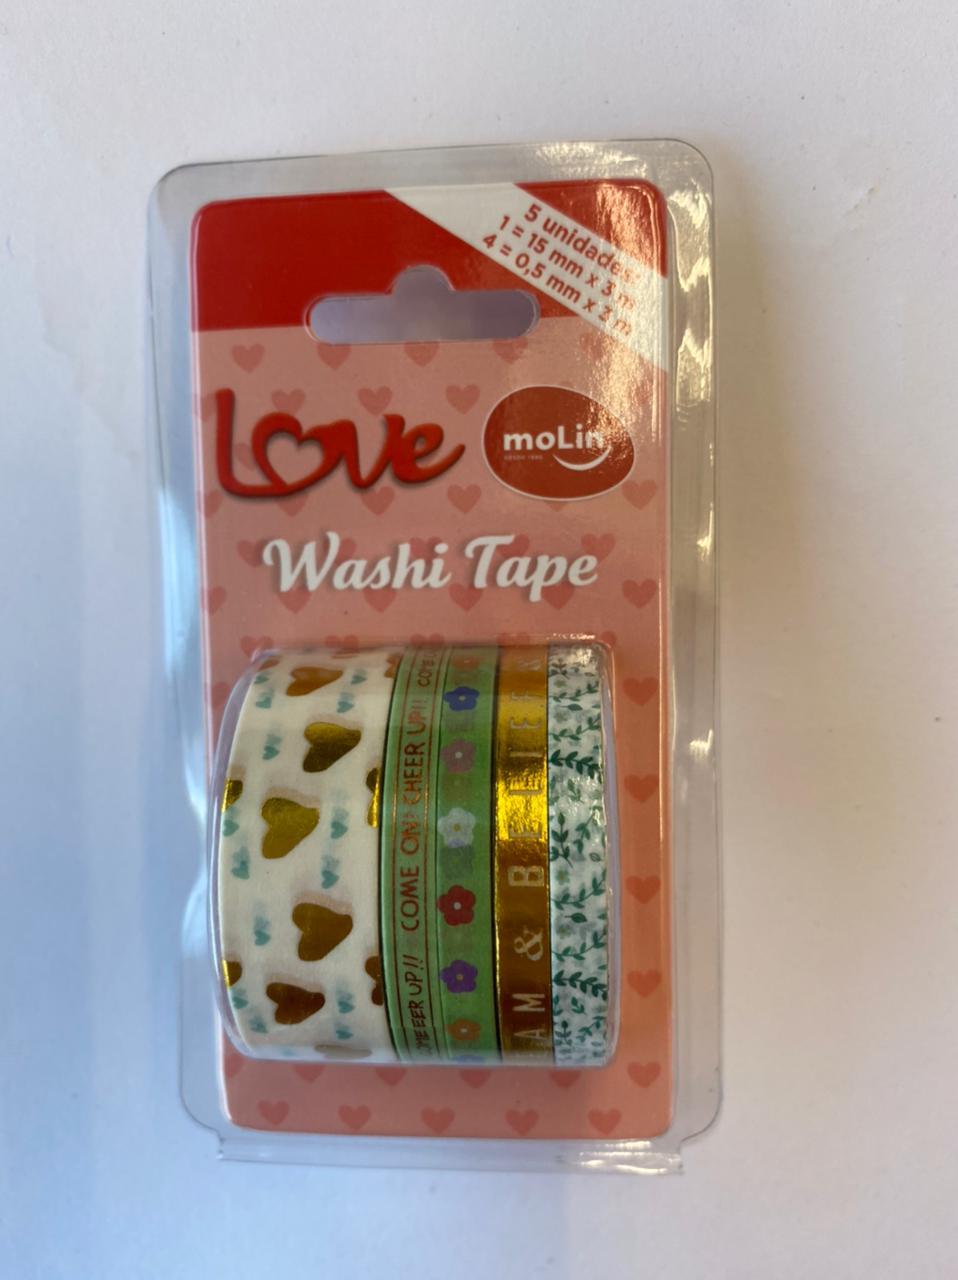 Washi Tape Slim - Molin Love - Verde